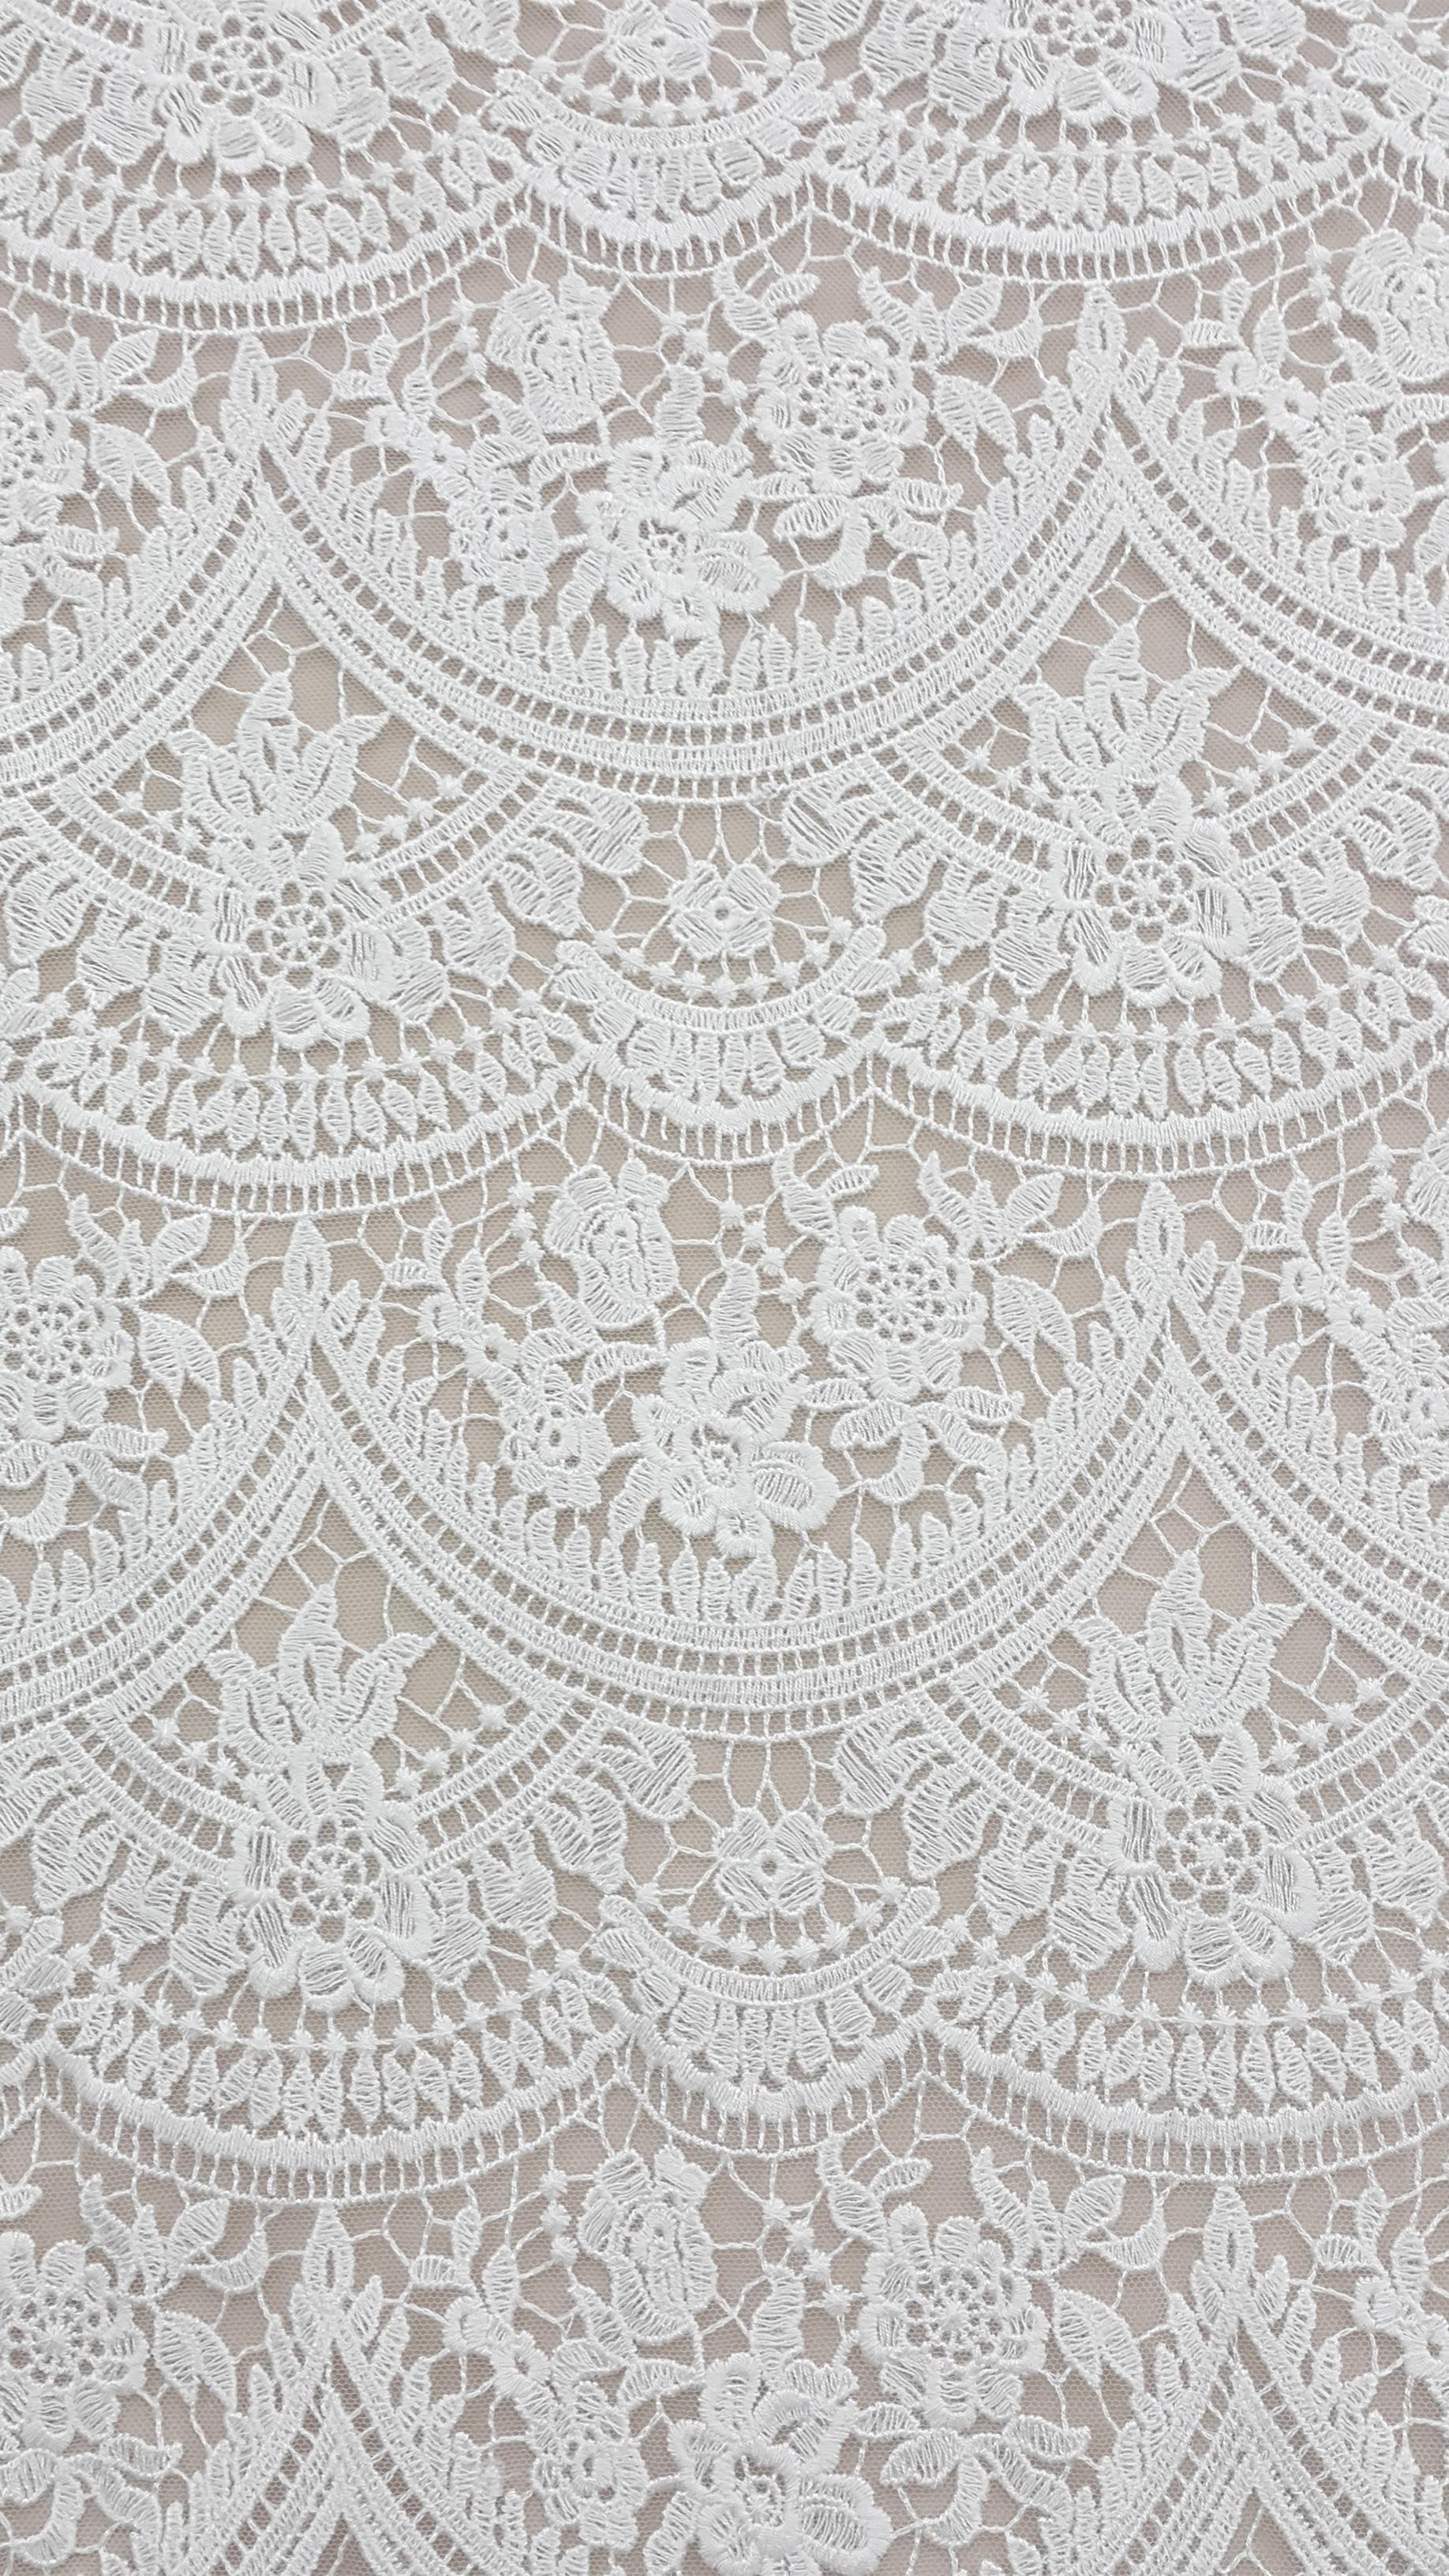 Scalloped & Geometric Laces Grace